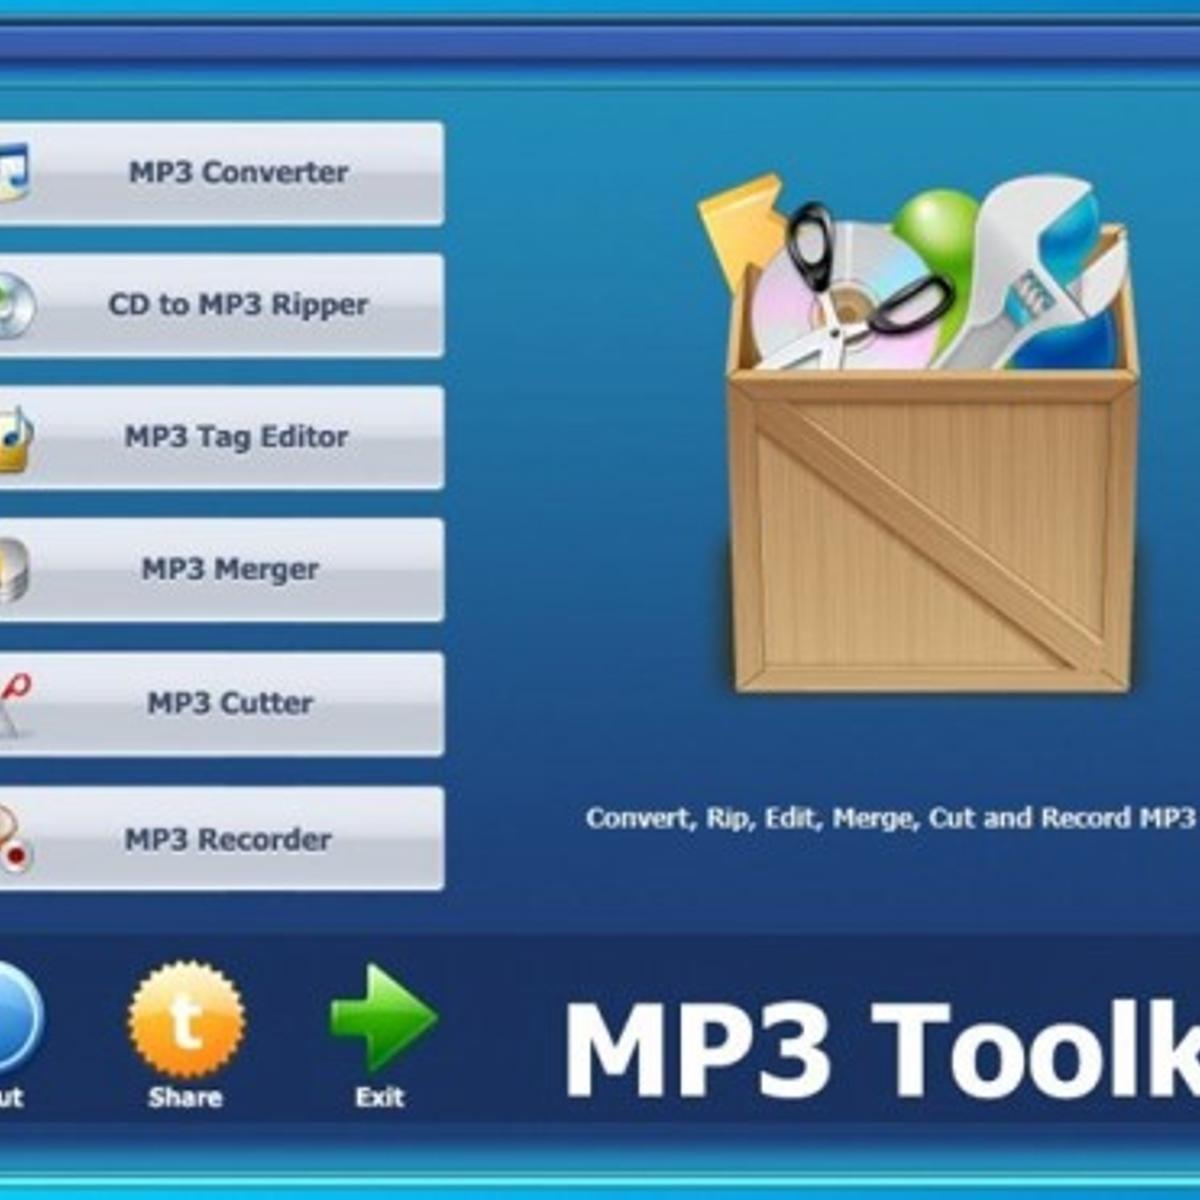 MP3 Toolkit Alternatives and Similar Software